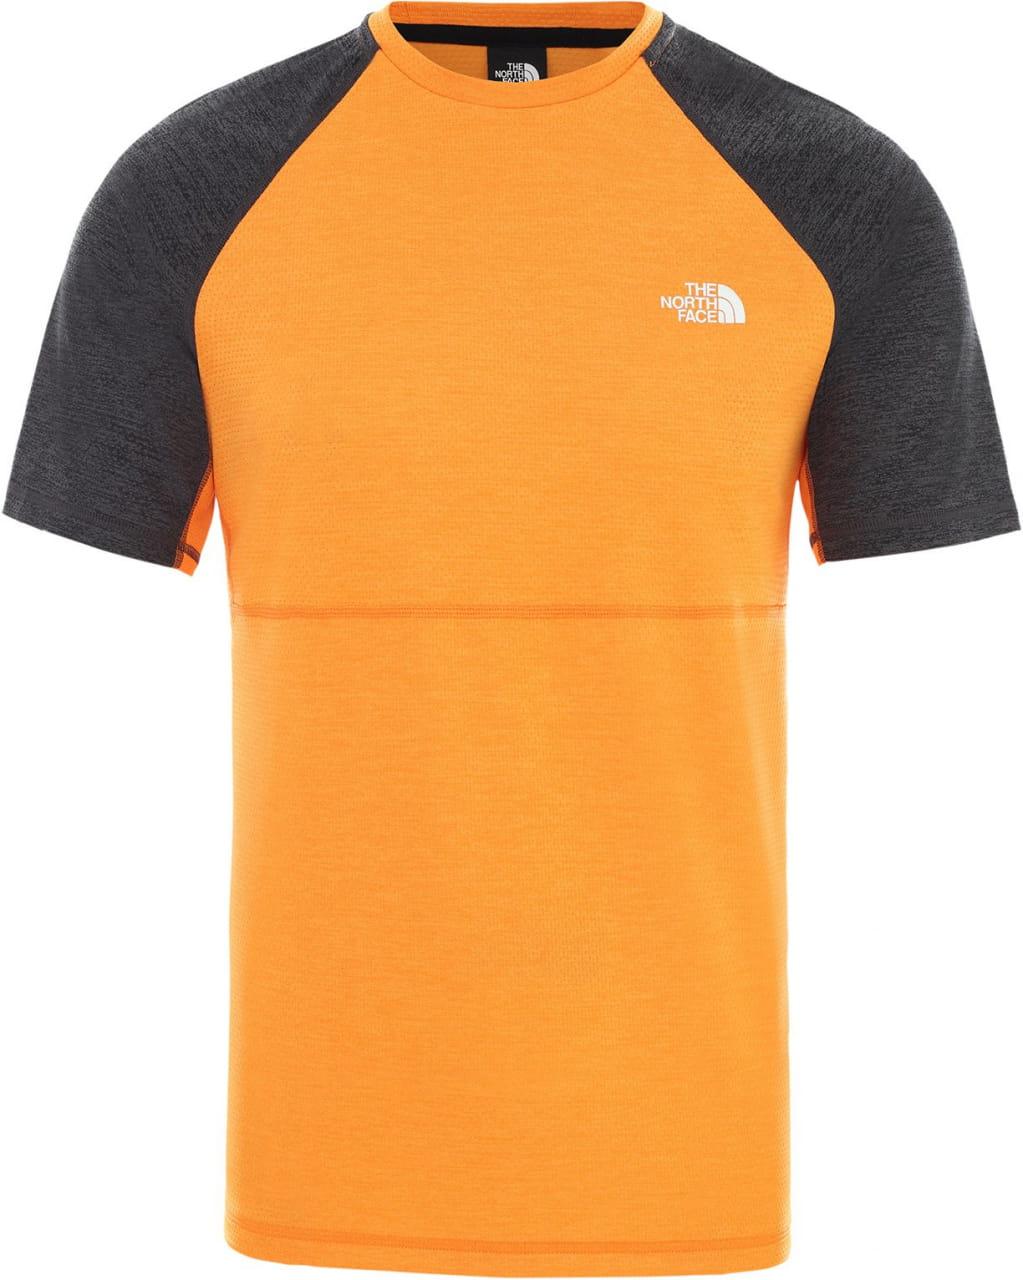 T-Shirts The North Face Men's Varuna T-Shirt